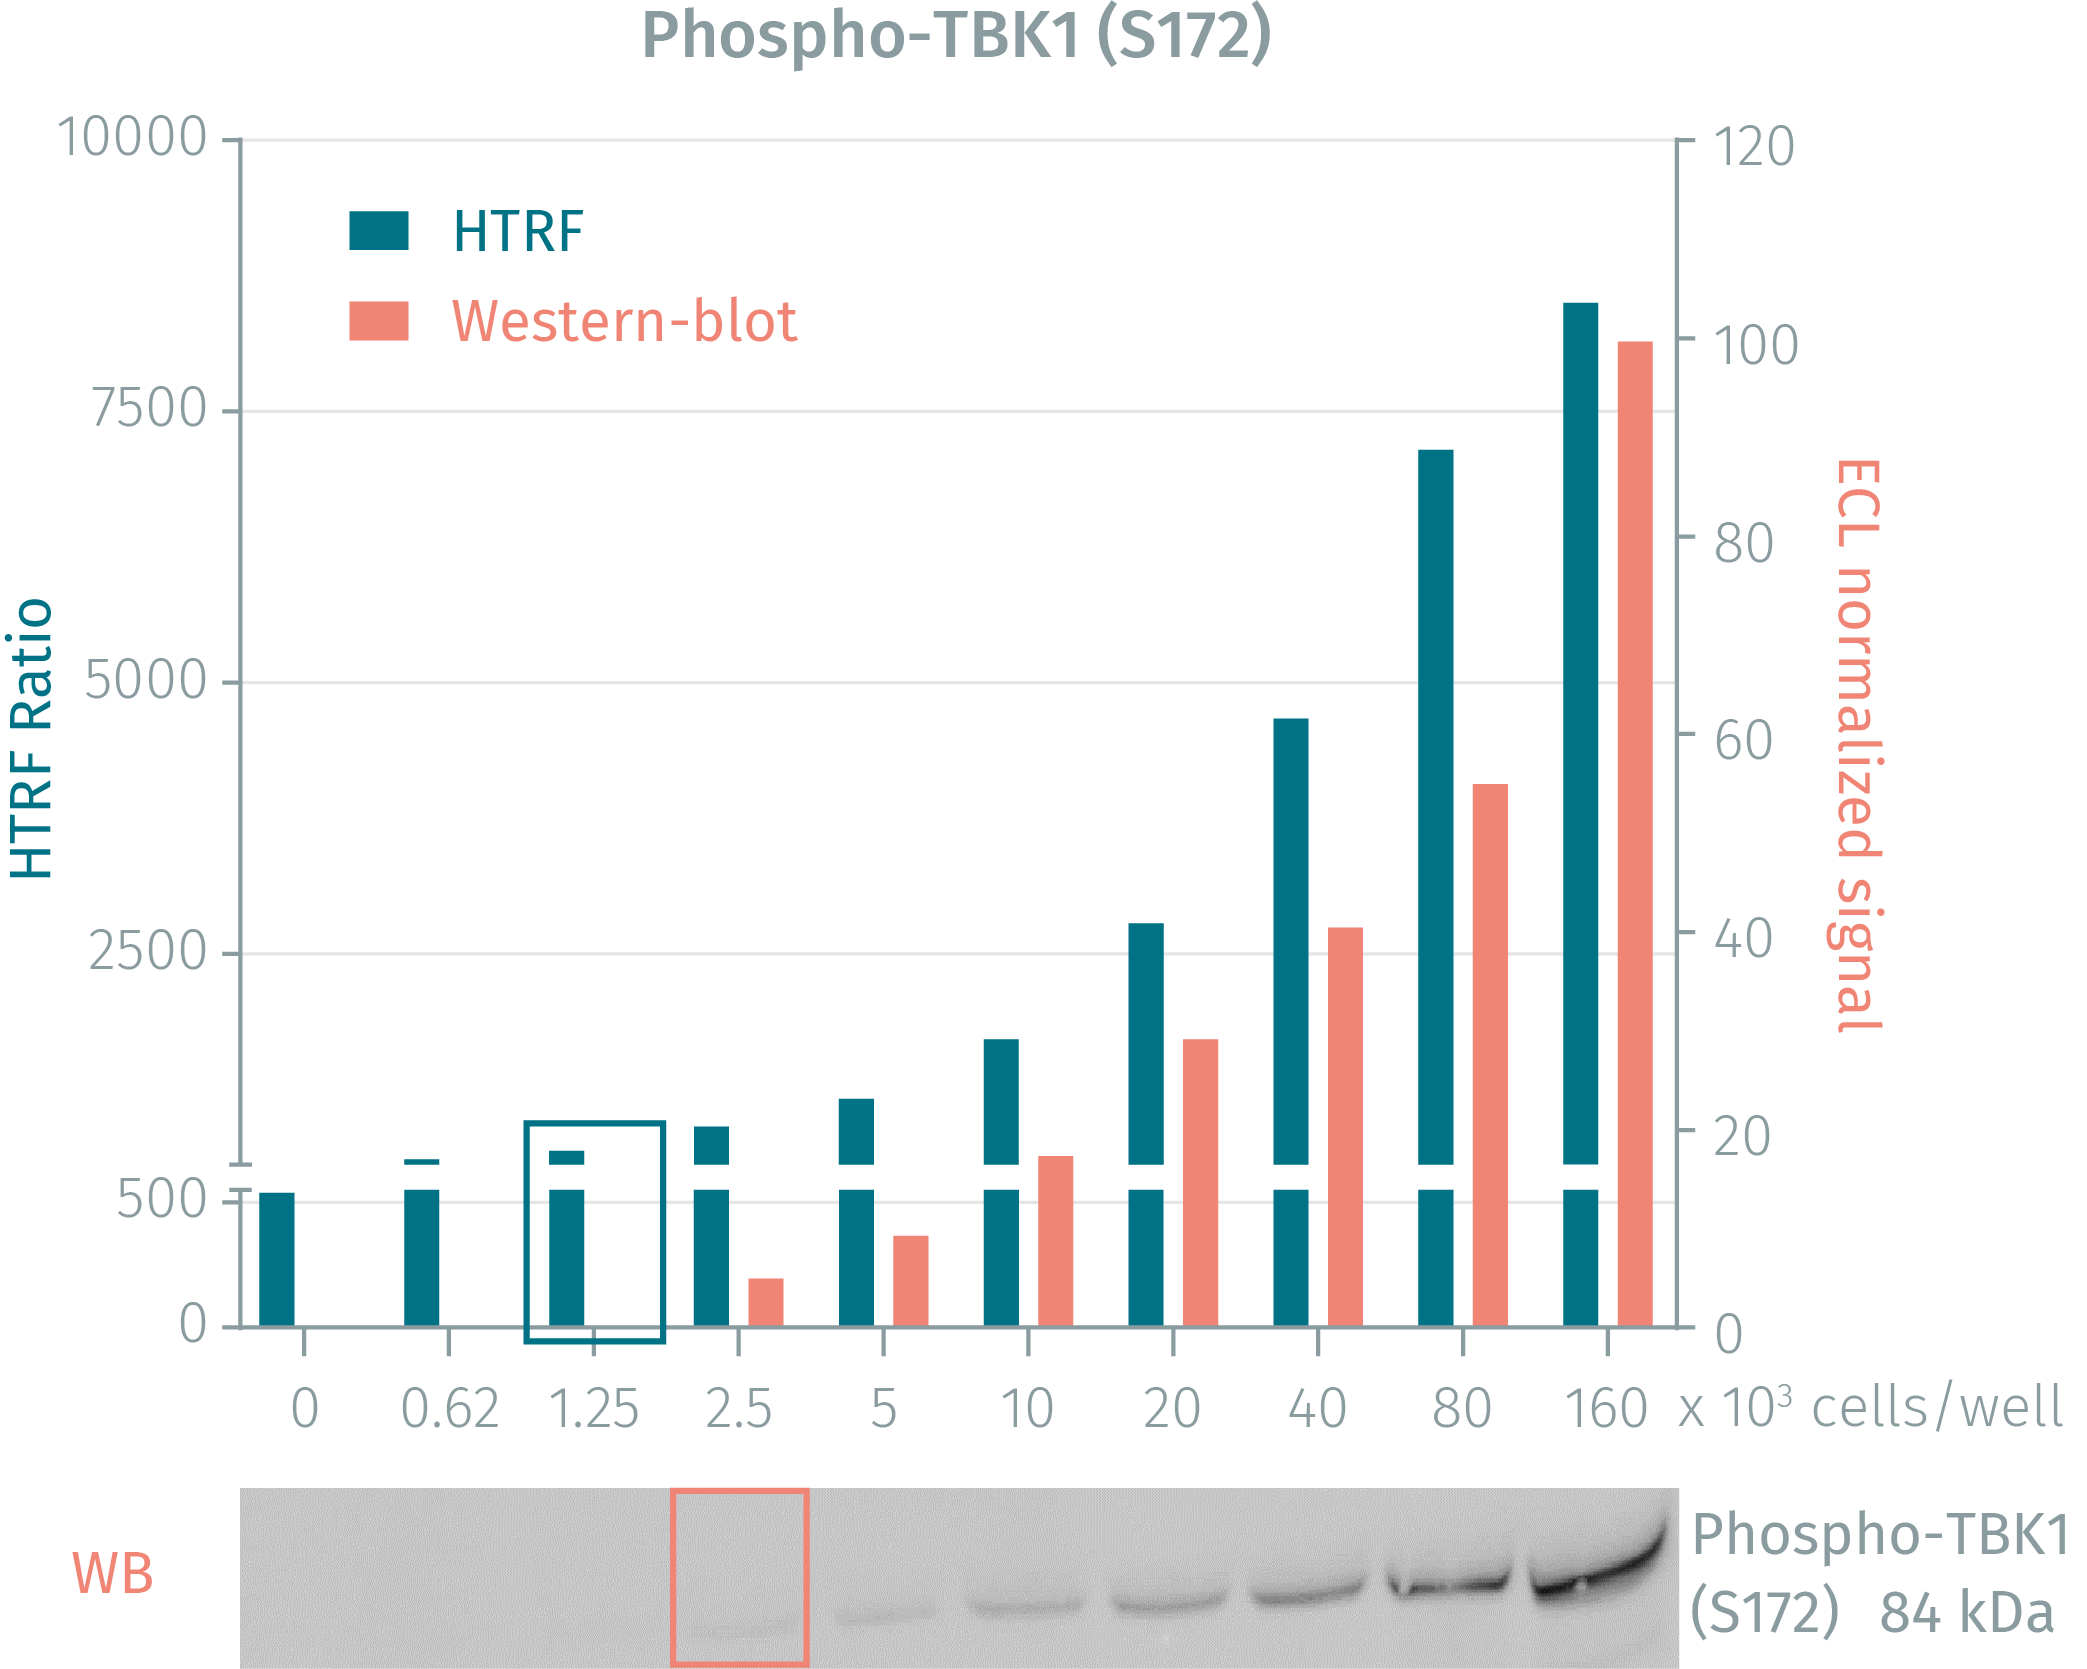 HTRF Phospho-TBK1 assay compared to WesternBlot